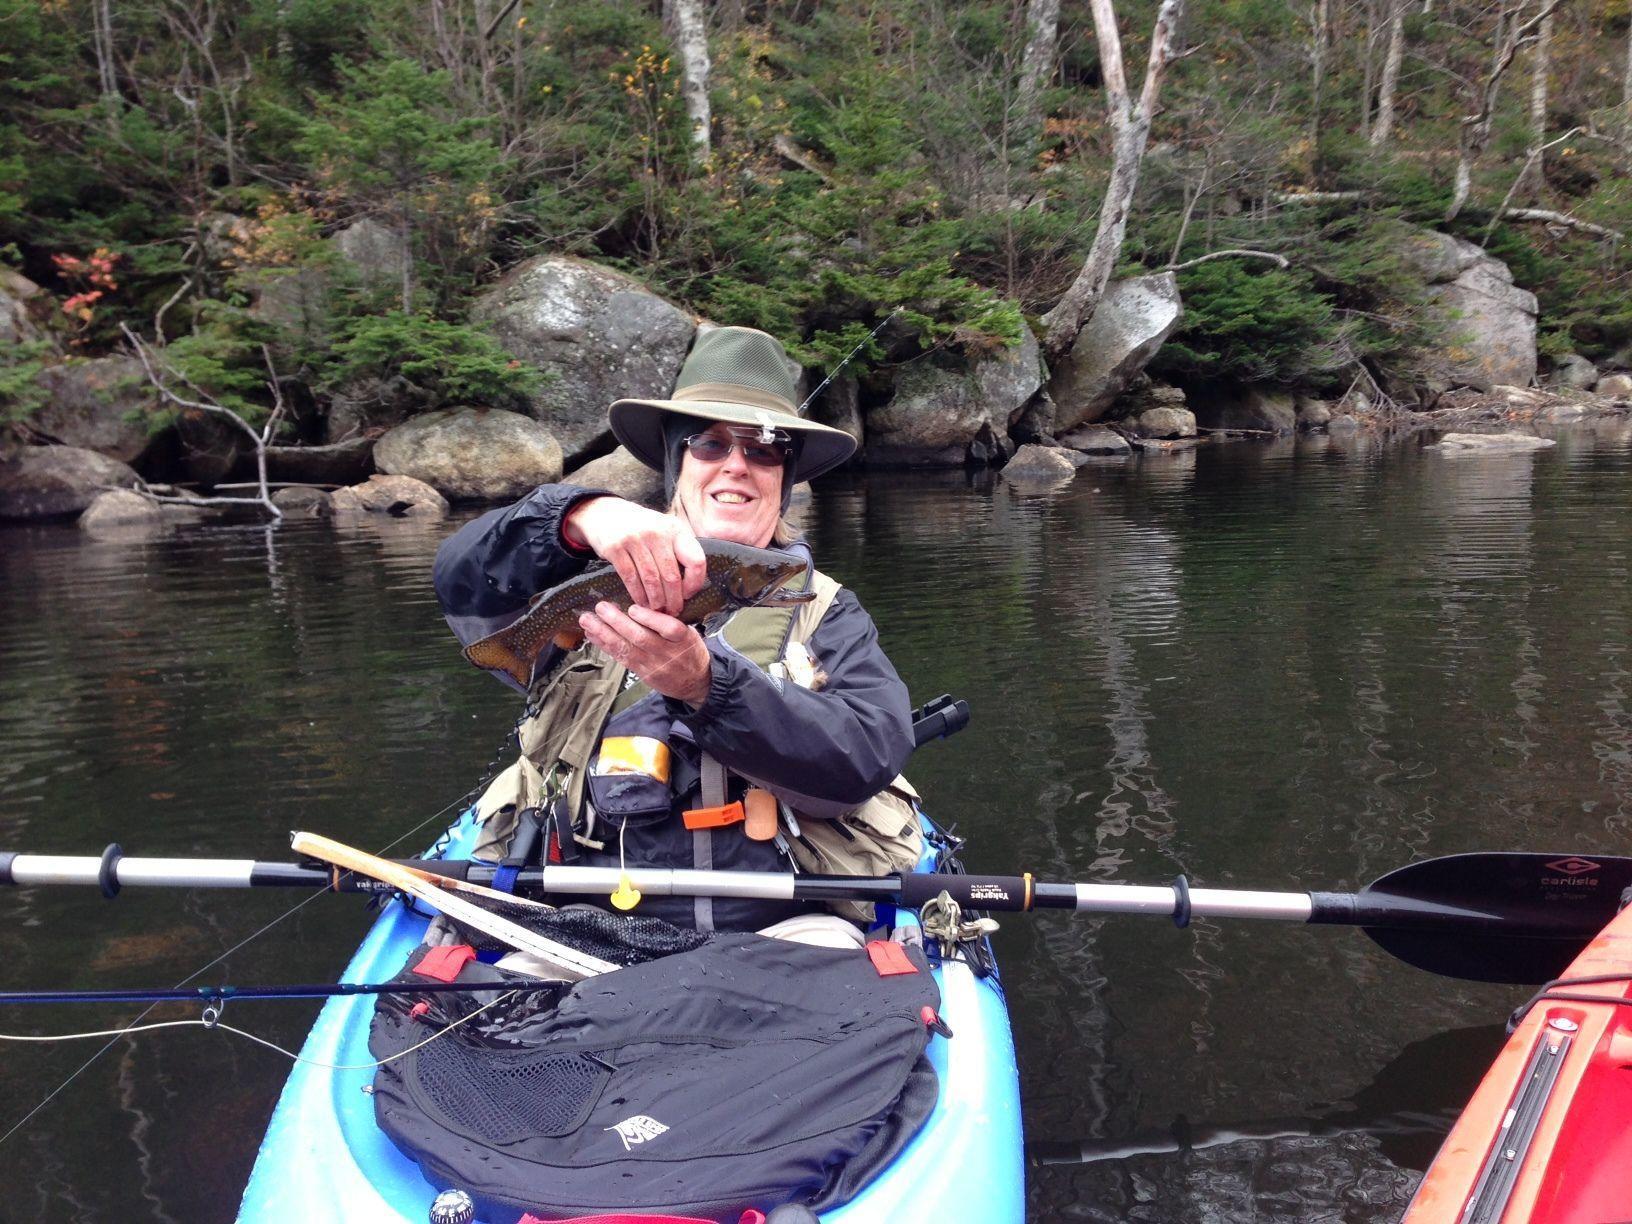 Brie - Boston Fishing Enthusiasts (Boston, MA) | Meetup